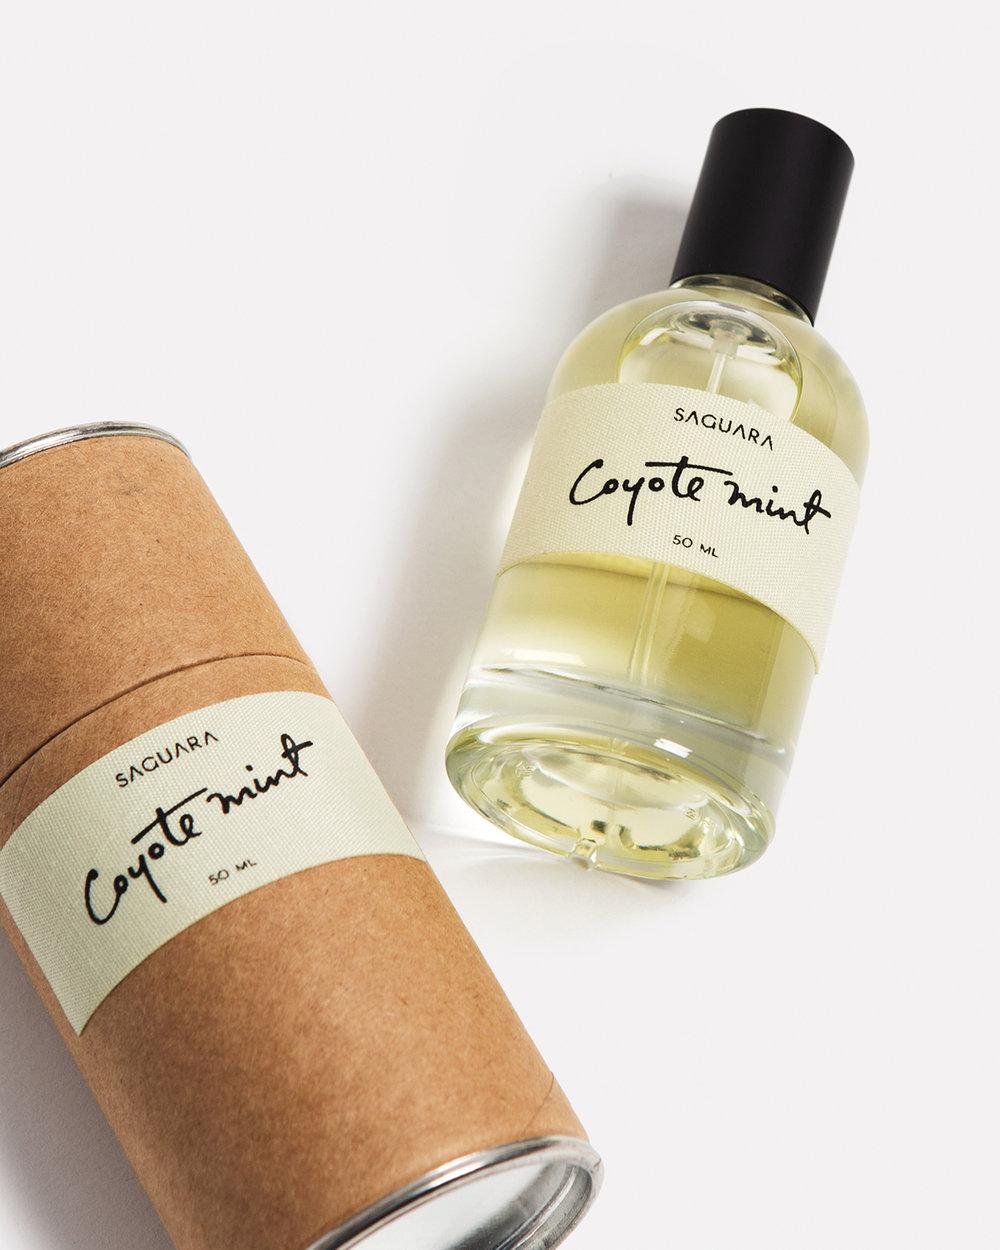 Saguara Perfumes 'Coyote Mint,' $90